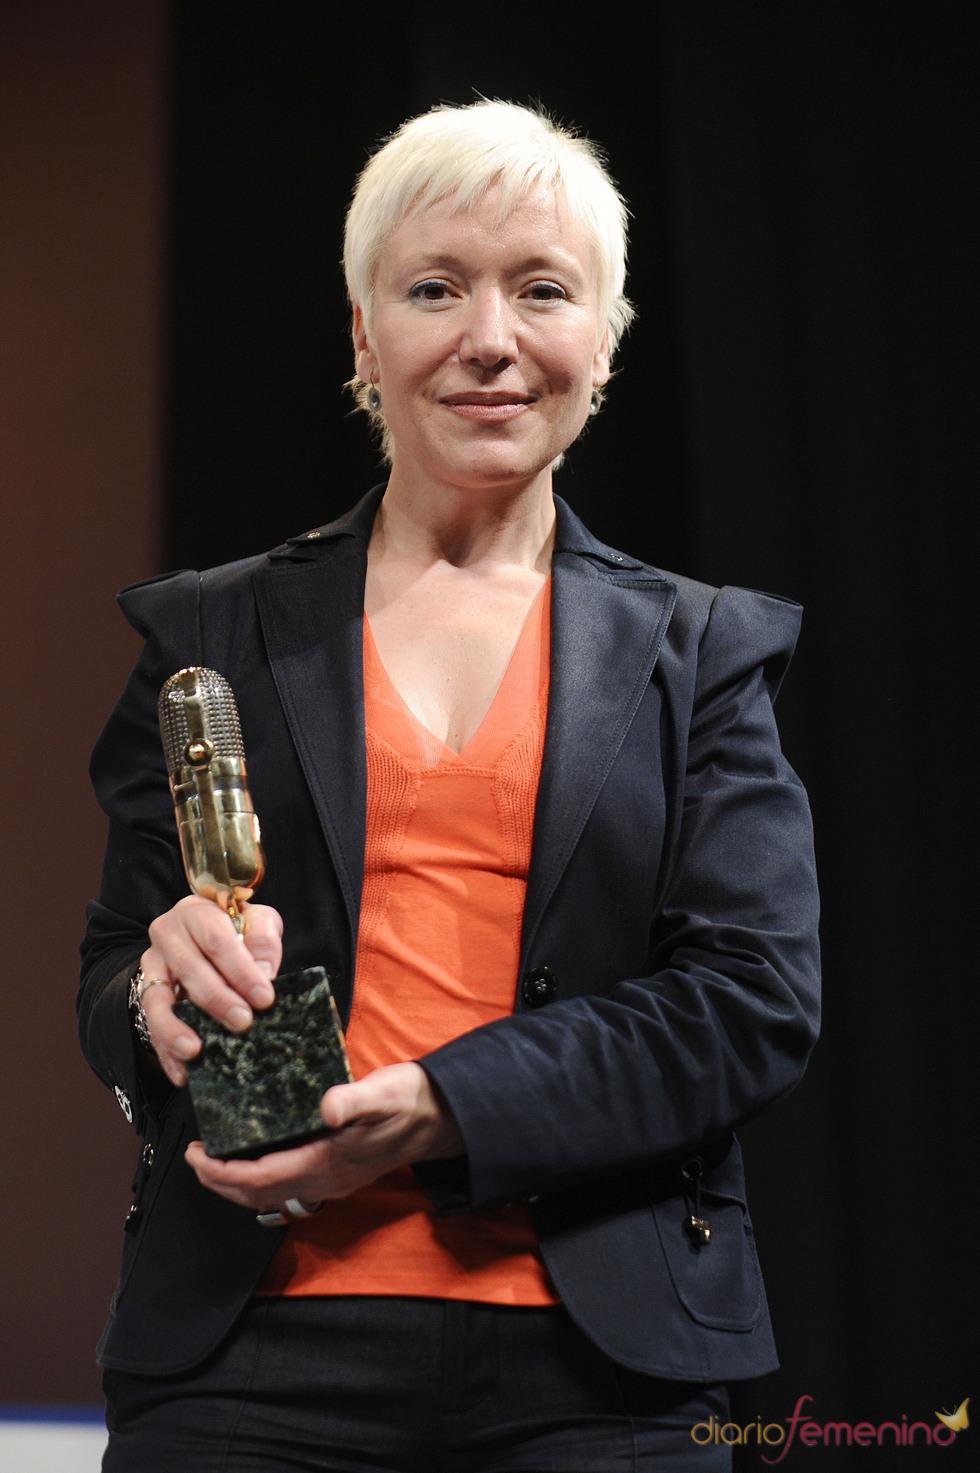 Rosa María Molló posa con su Micrófono de Oro 2011